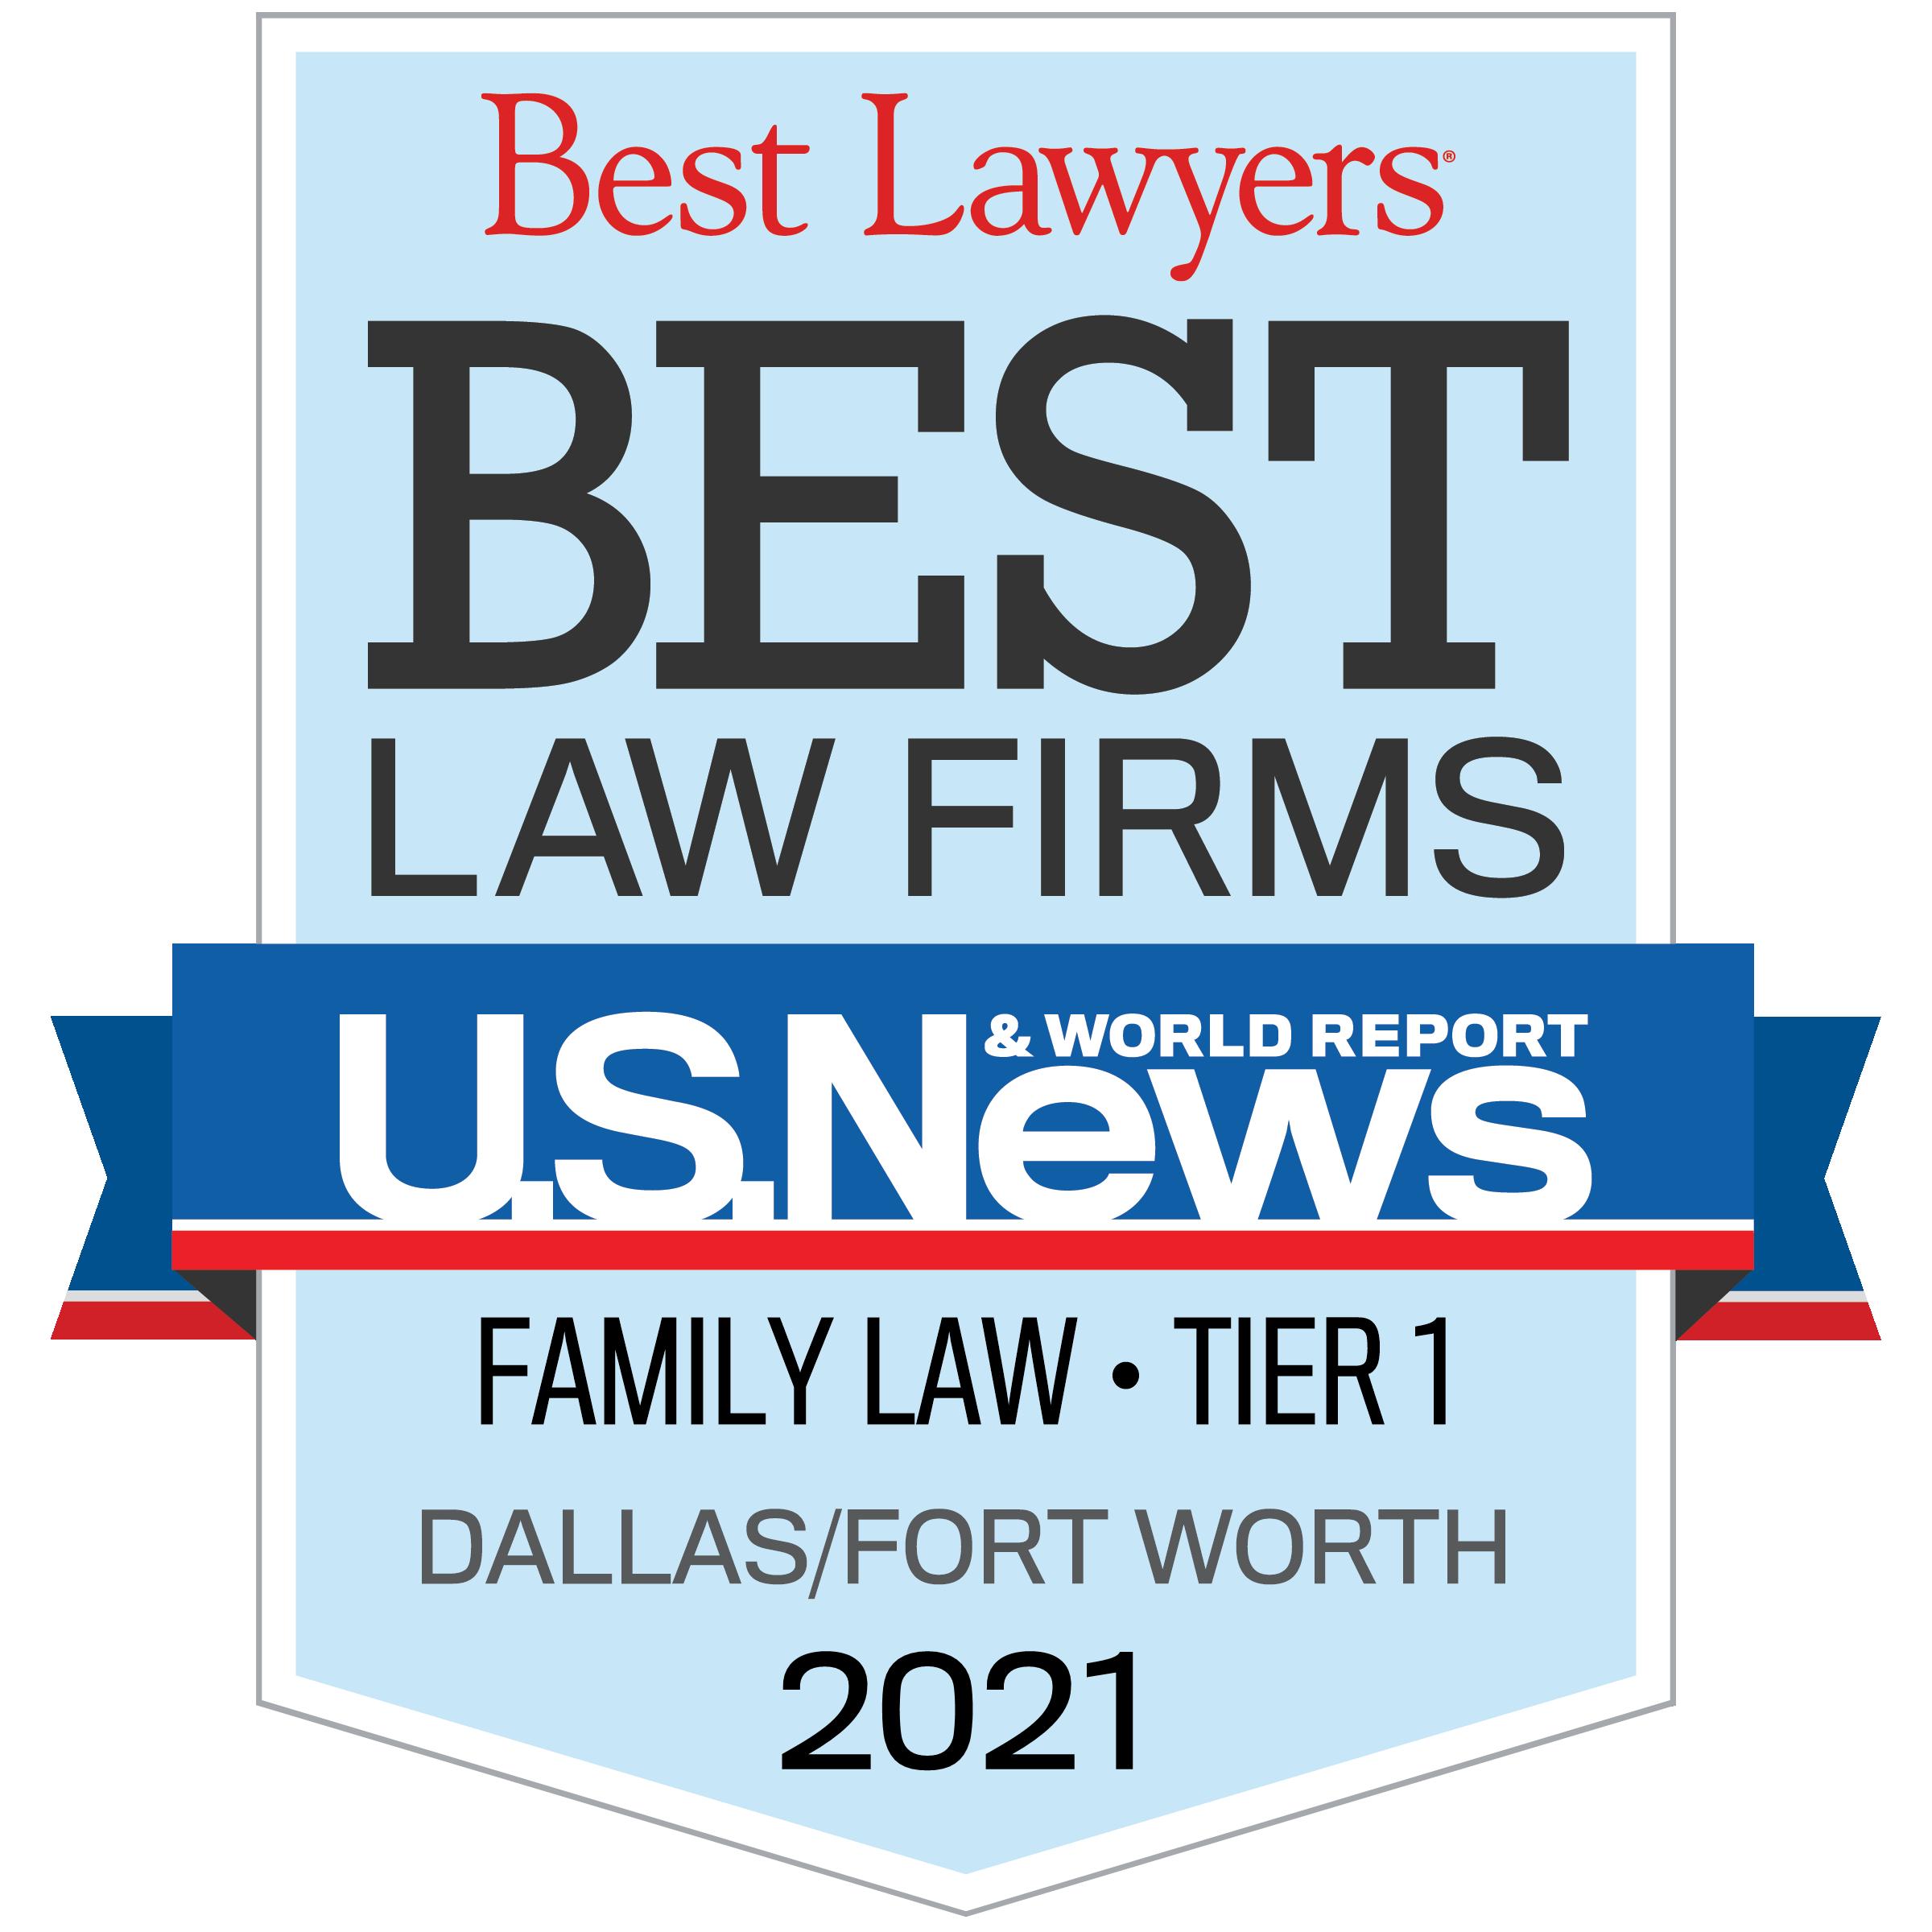 Best Lawyers Best Law Firm Family Law Dallas 2021